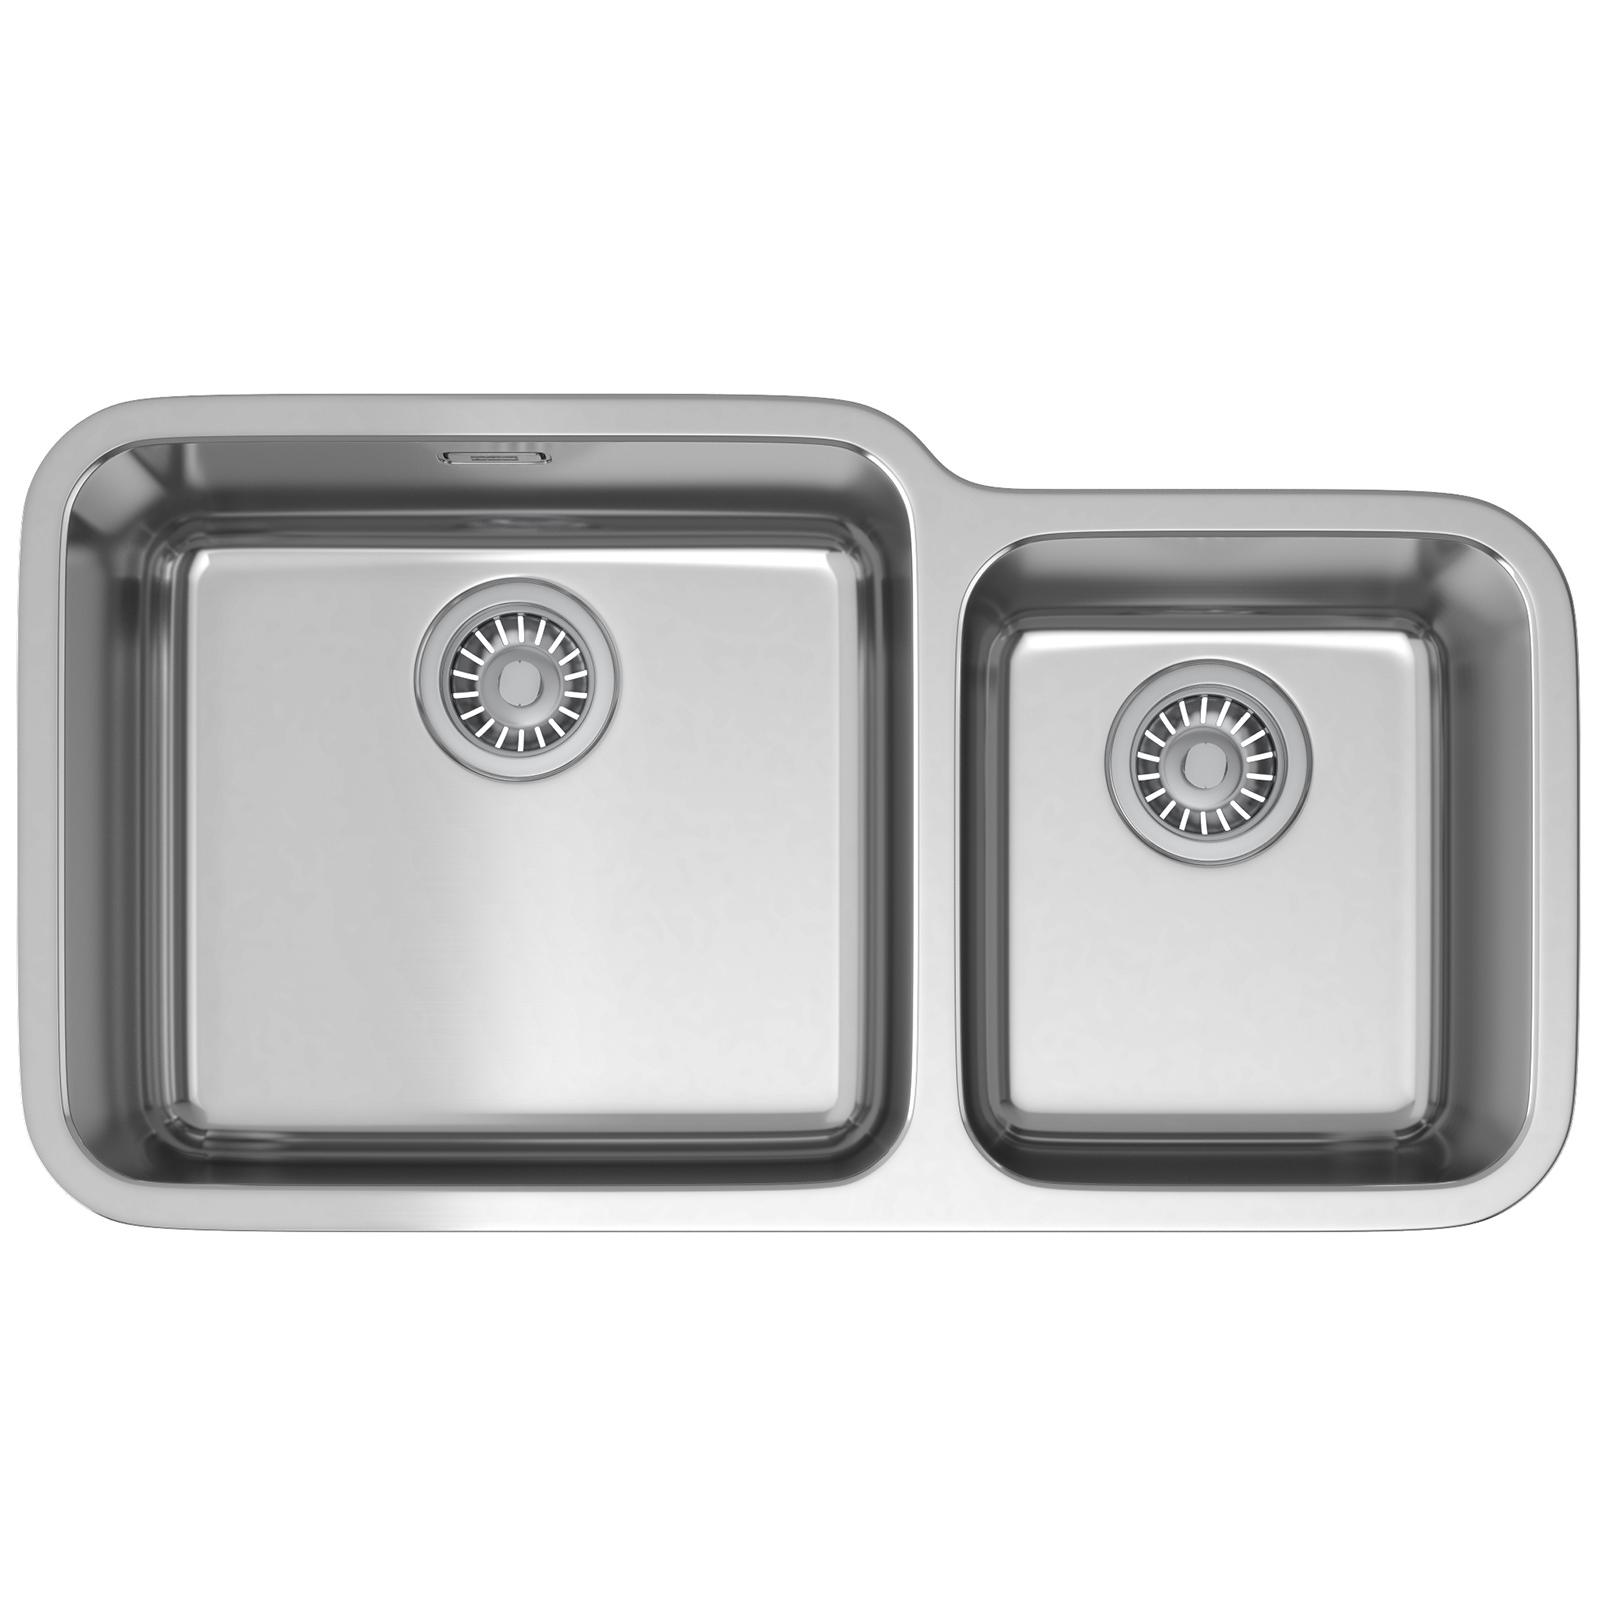 Franke Largo Sink : Franke Largo LAX 120 45-30 Stainless Steel 1.5 Bowl Undermount Sink